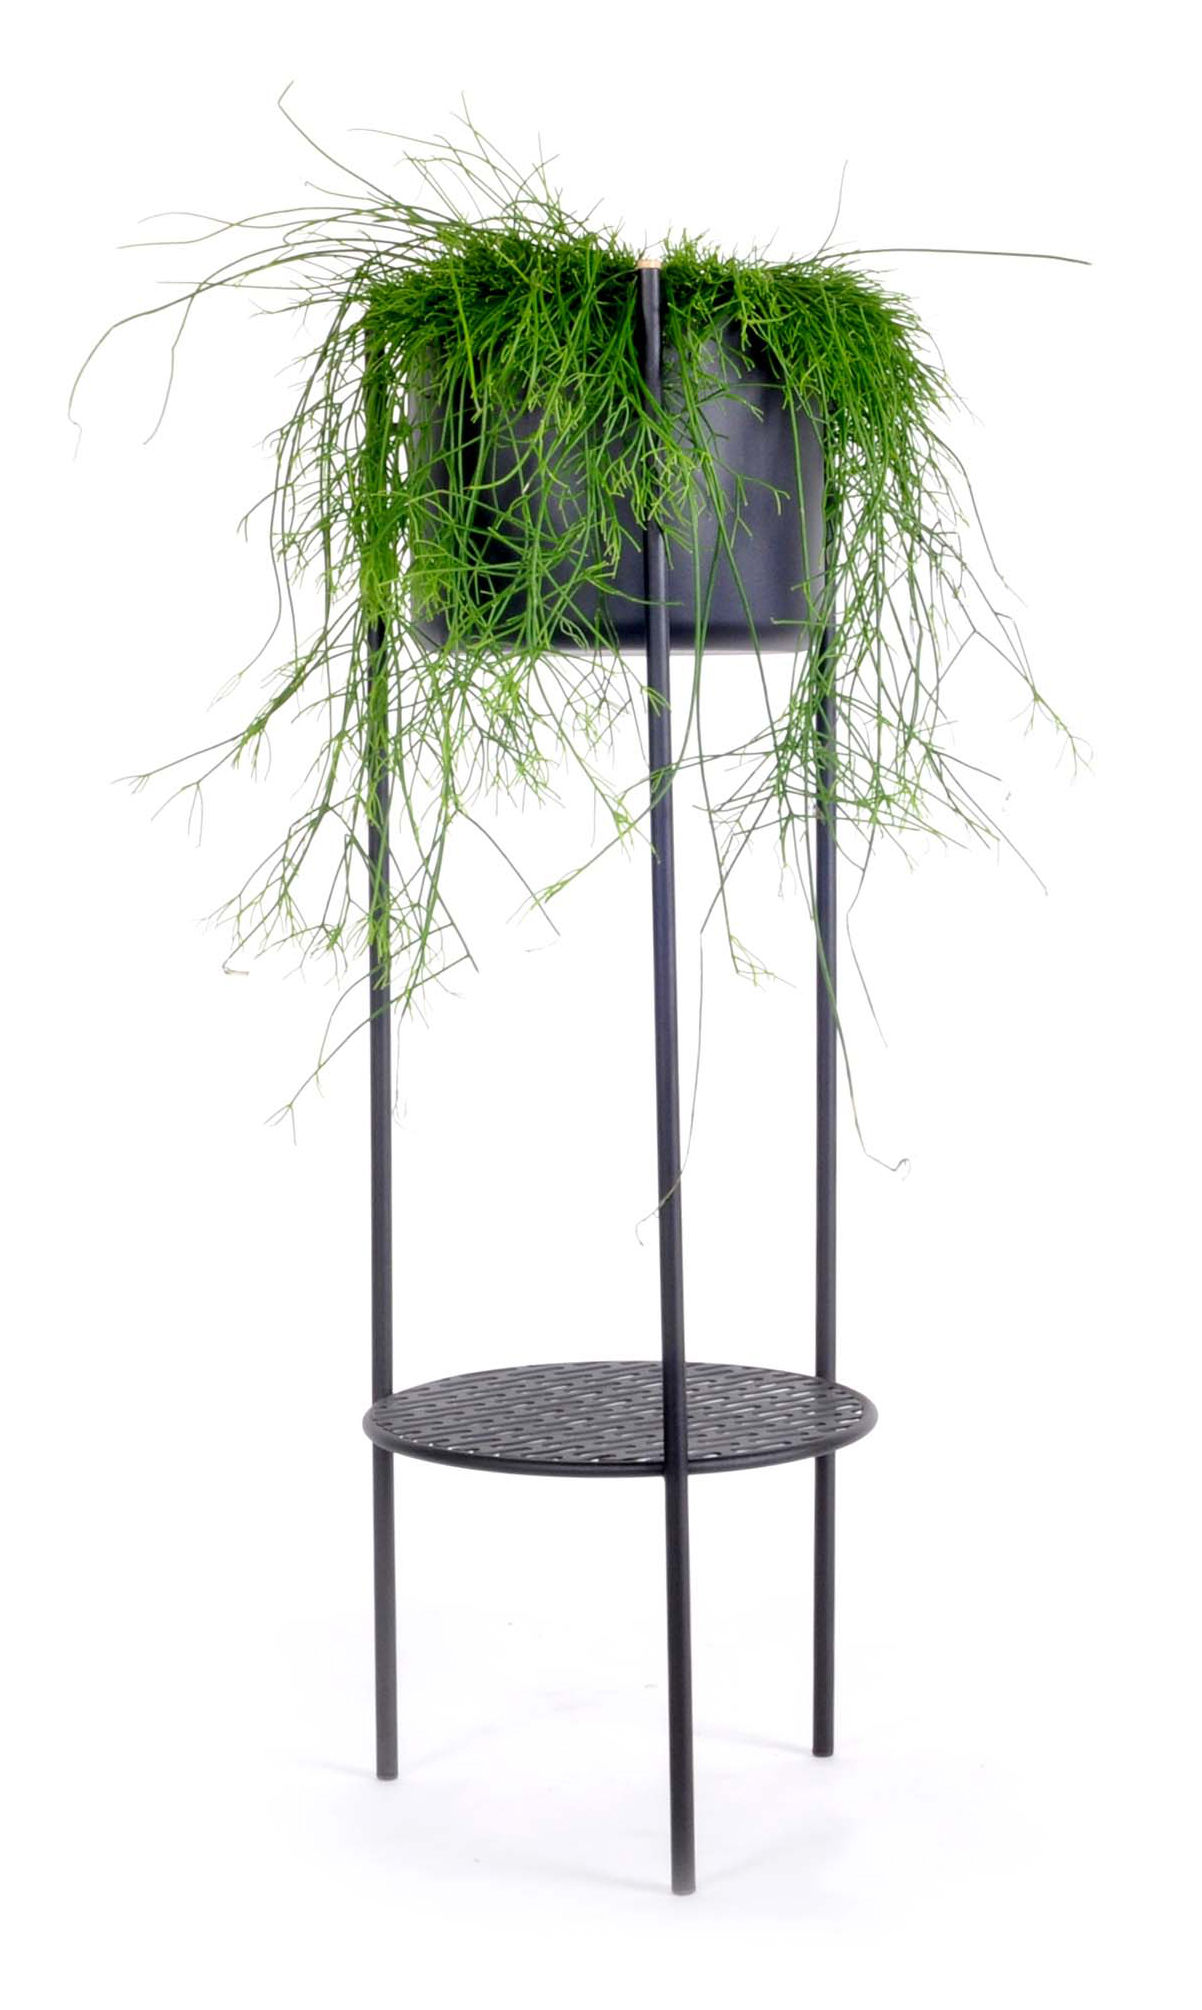 Outdoor - Pots & Plants - Ent Large Flowerpot - H 98 cm / Metal by XL Boom - H 98 cm / Black - Epoxy lacquered steel